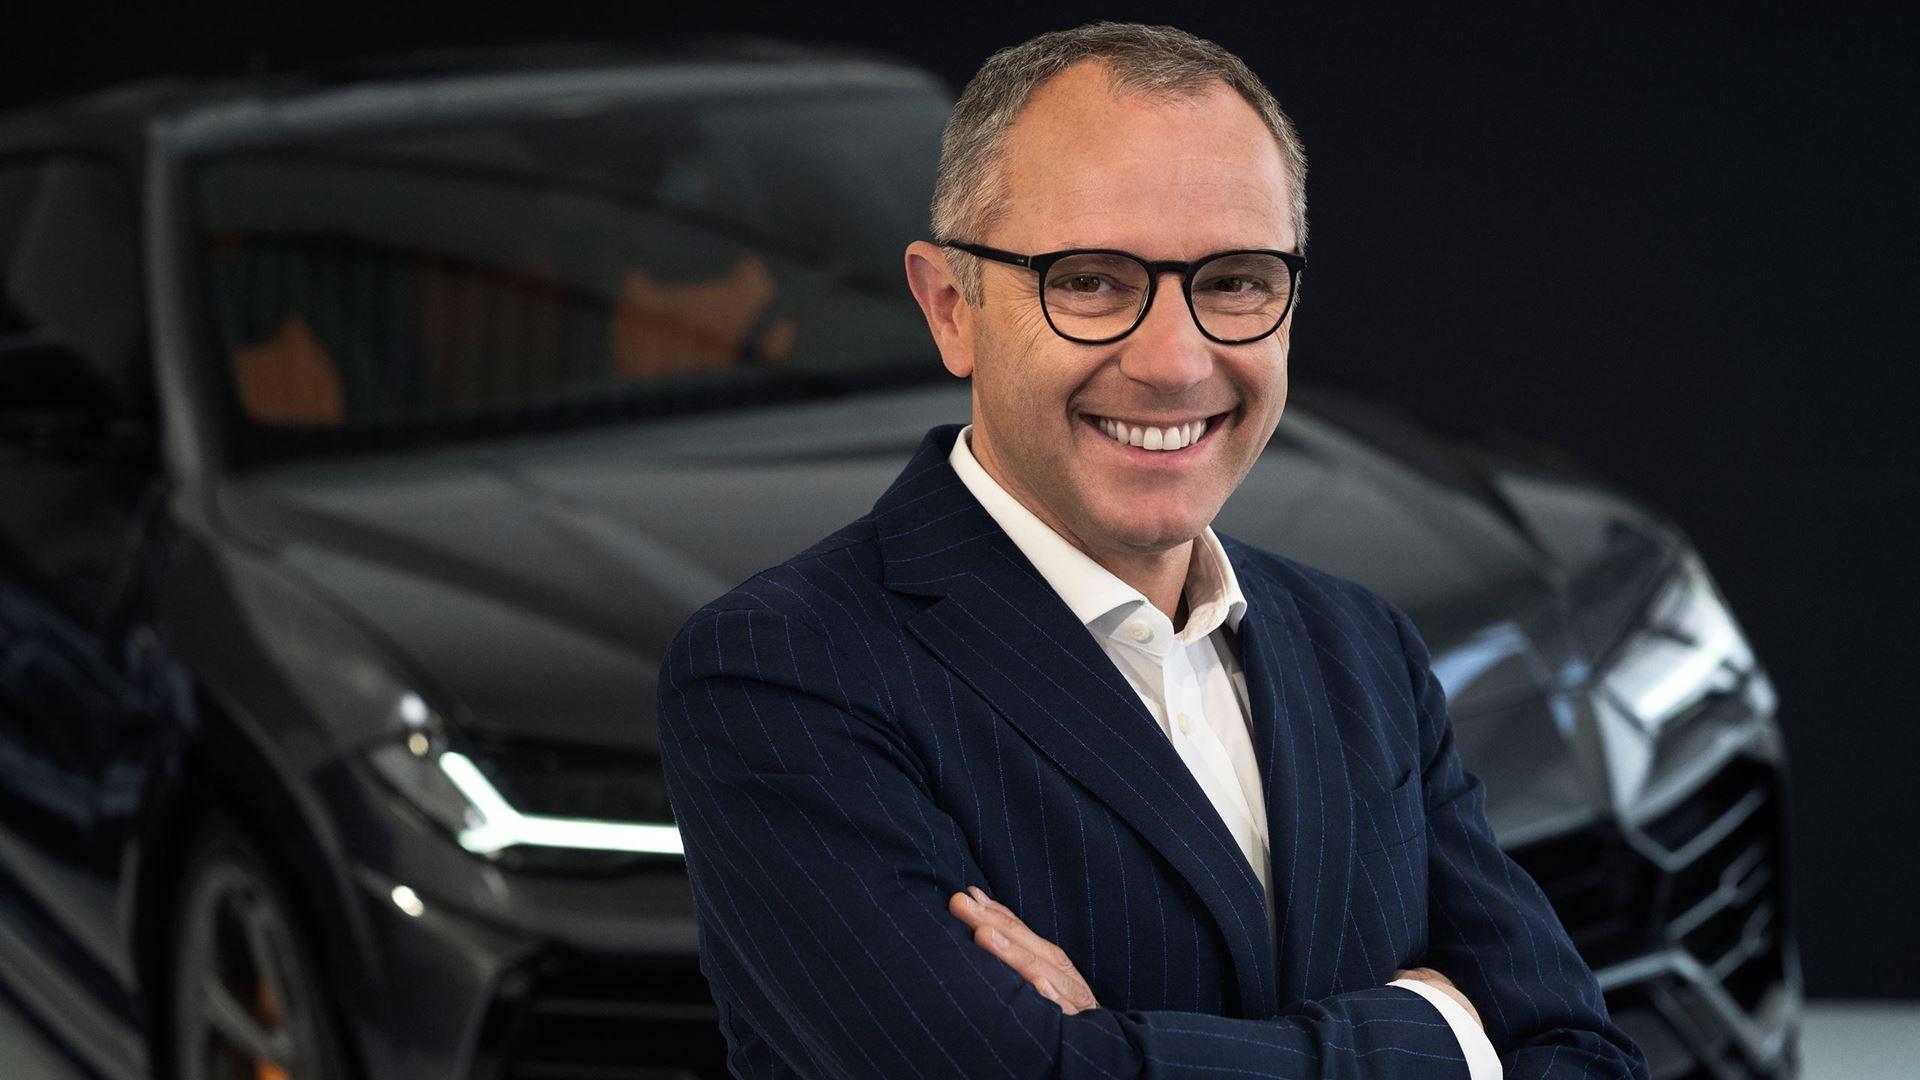 Chairman and CEO of Automobili Lamborghini, Stefano Domenicali, will leave leadership of the Italian super sports car company for a new professional role - Image 1